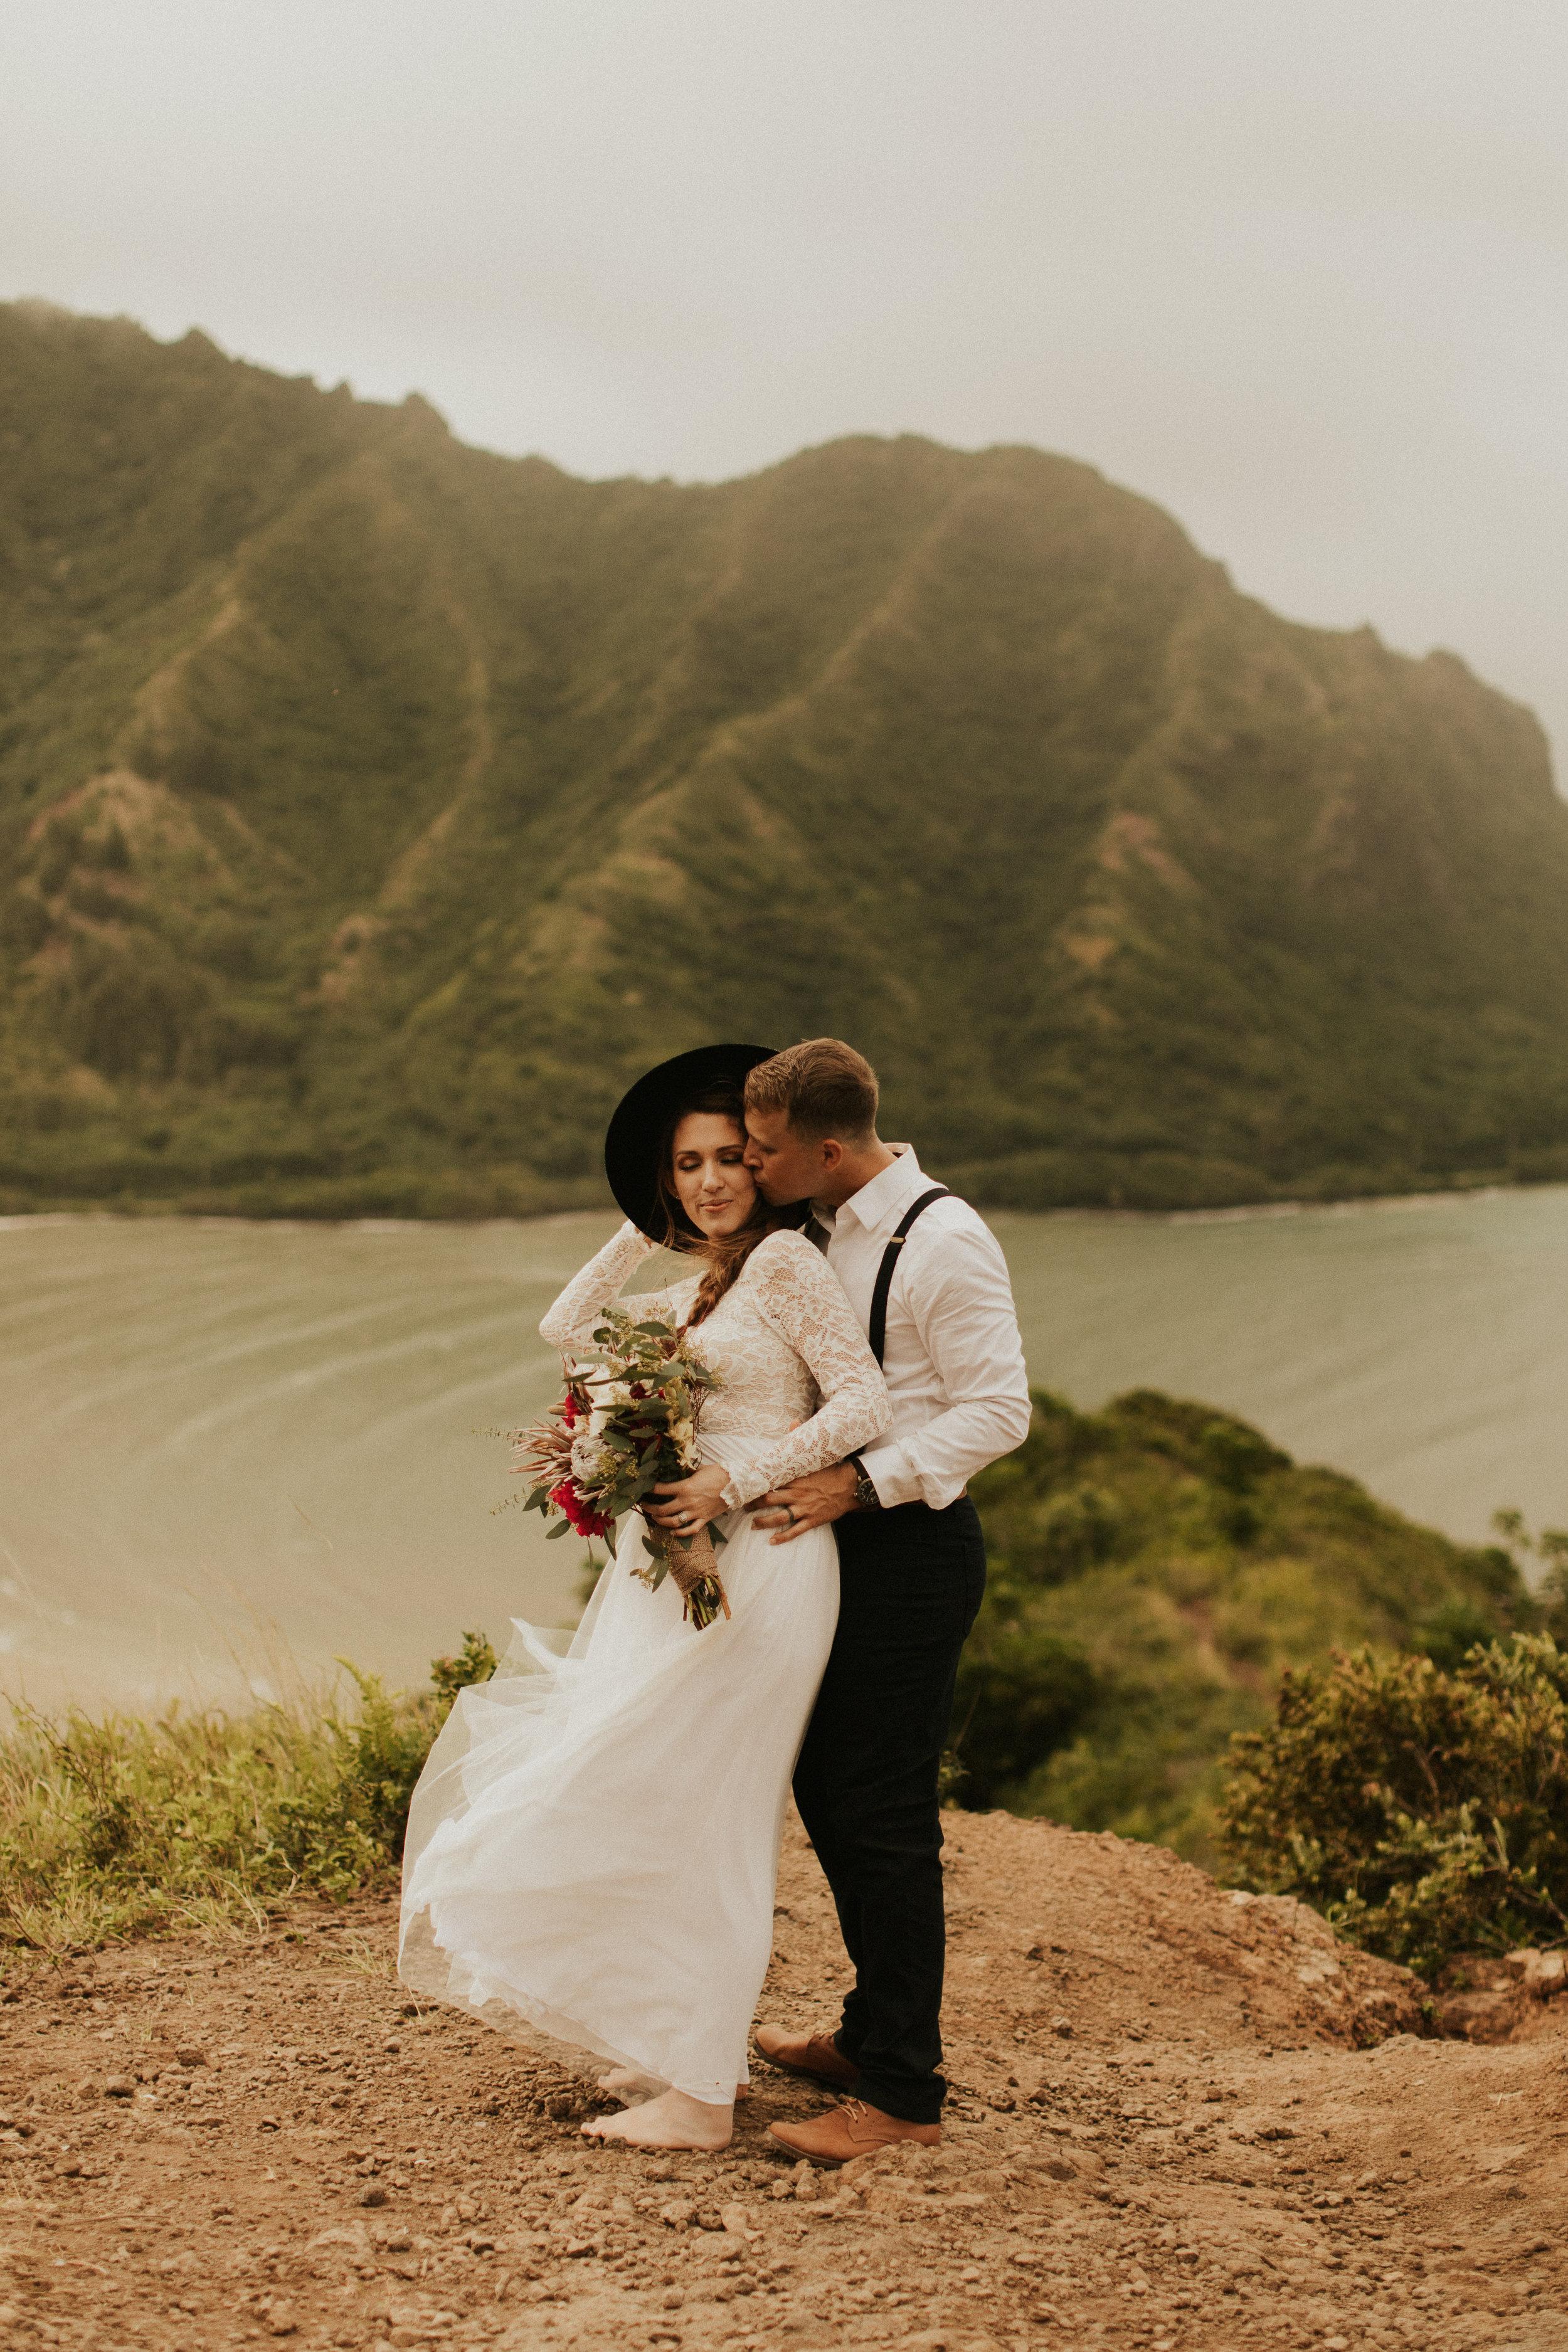 the-mclachlans-destination-elopement-photographers-mountain-hike-sena-eric-118.jpg